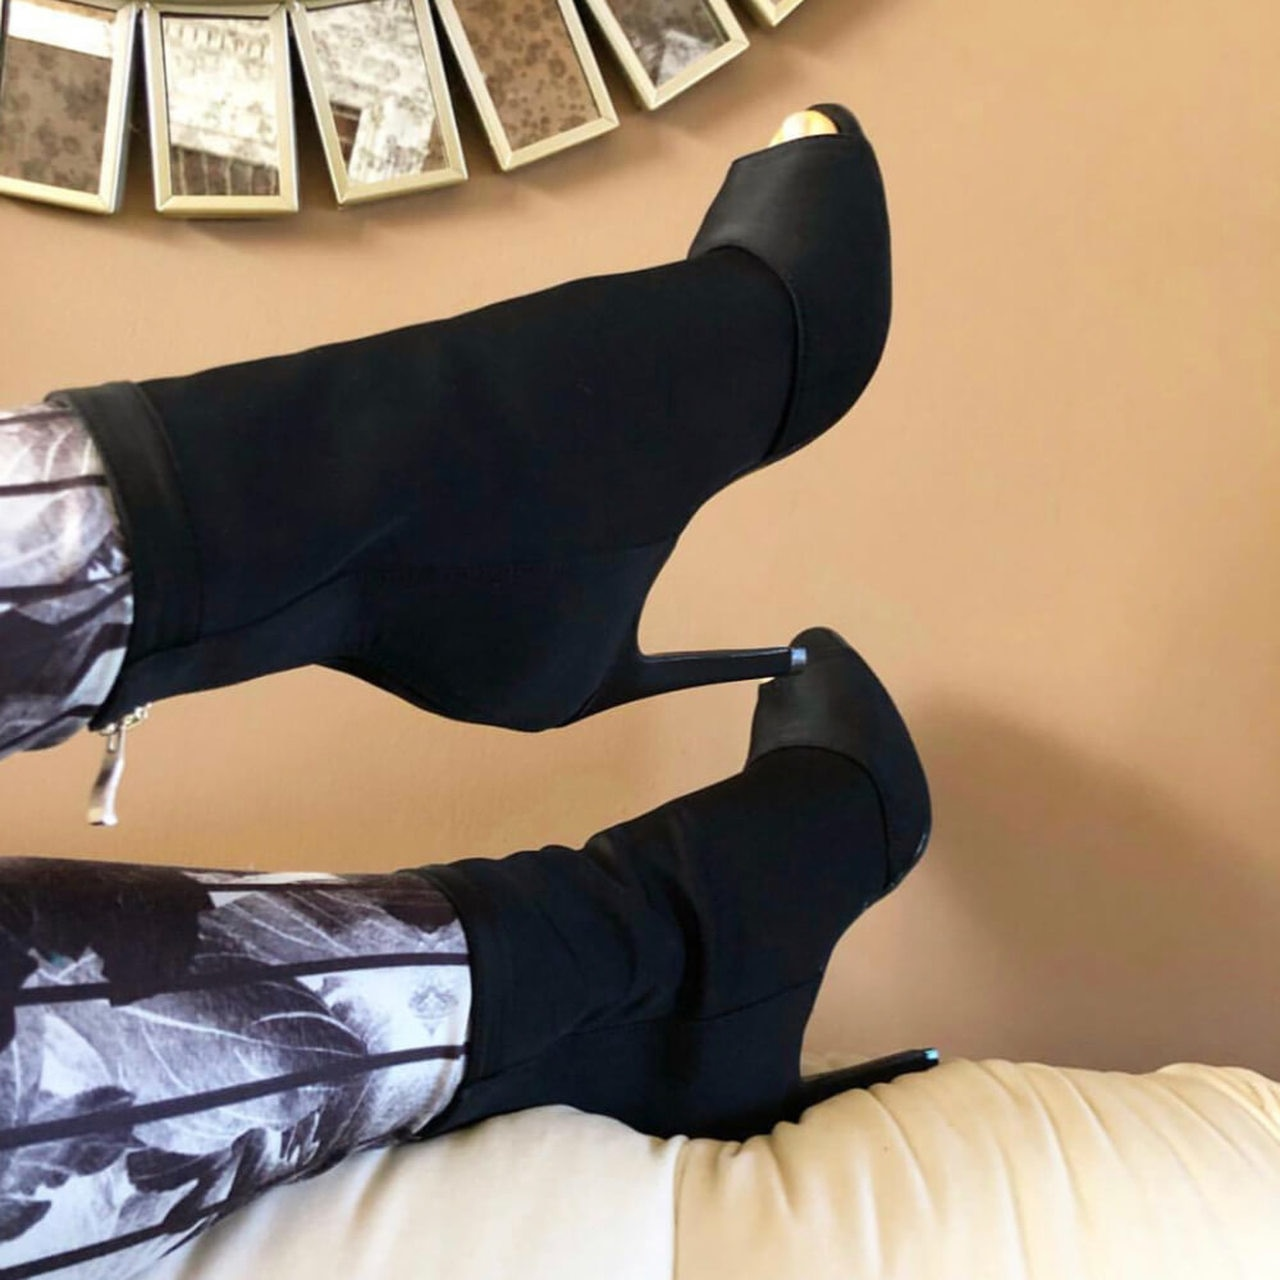 Discounts Sale Jazz Salsa Ballroom Latin Dance Shoes Heel For Dancing Women Training Ladies Boot Black Flock 1022 Summer Boots